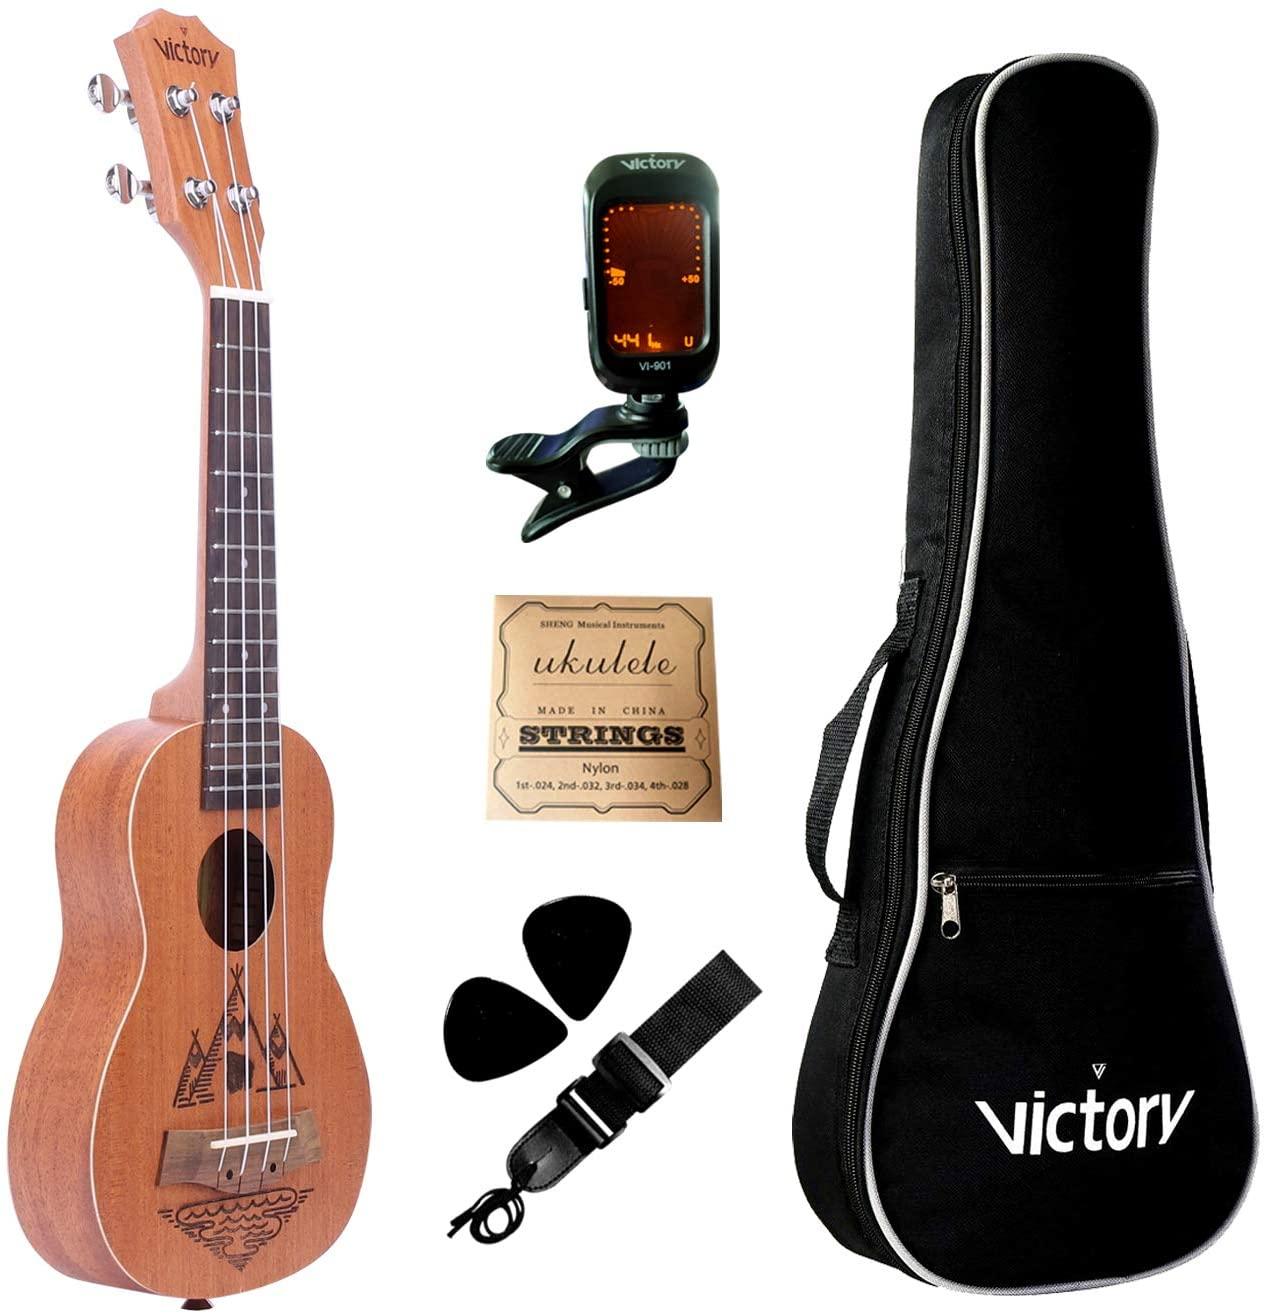 VIVICTORY Folk Art Soprano Ukulele 21 Inch, Mahogany Body, Aquila Strings with Beginner Kit : Tuner, Gig Bag, Straps, Picks and Nylon String (Soprano Ukulele 21